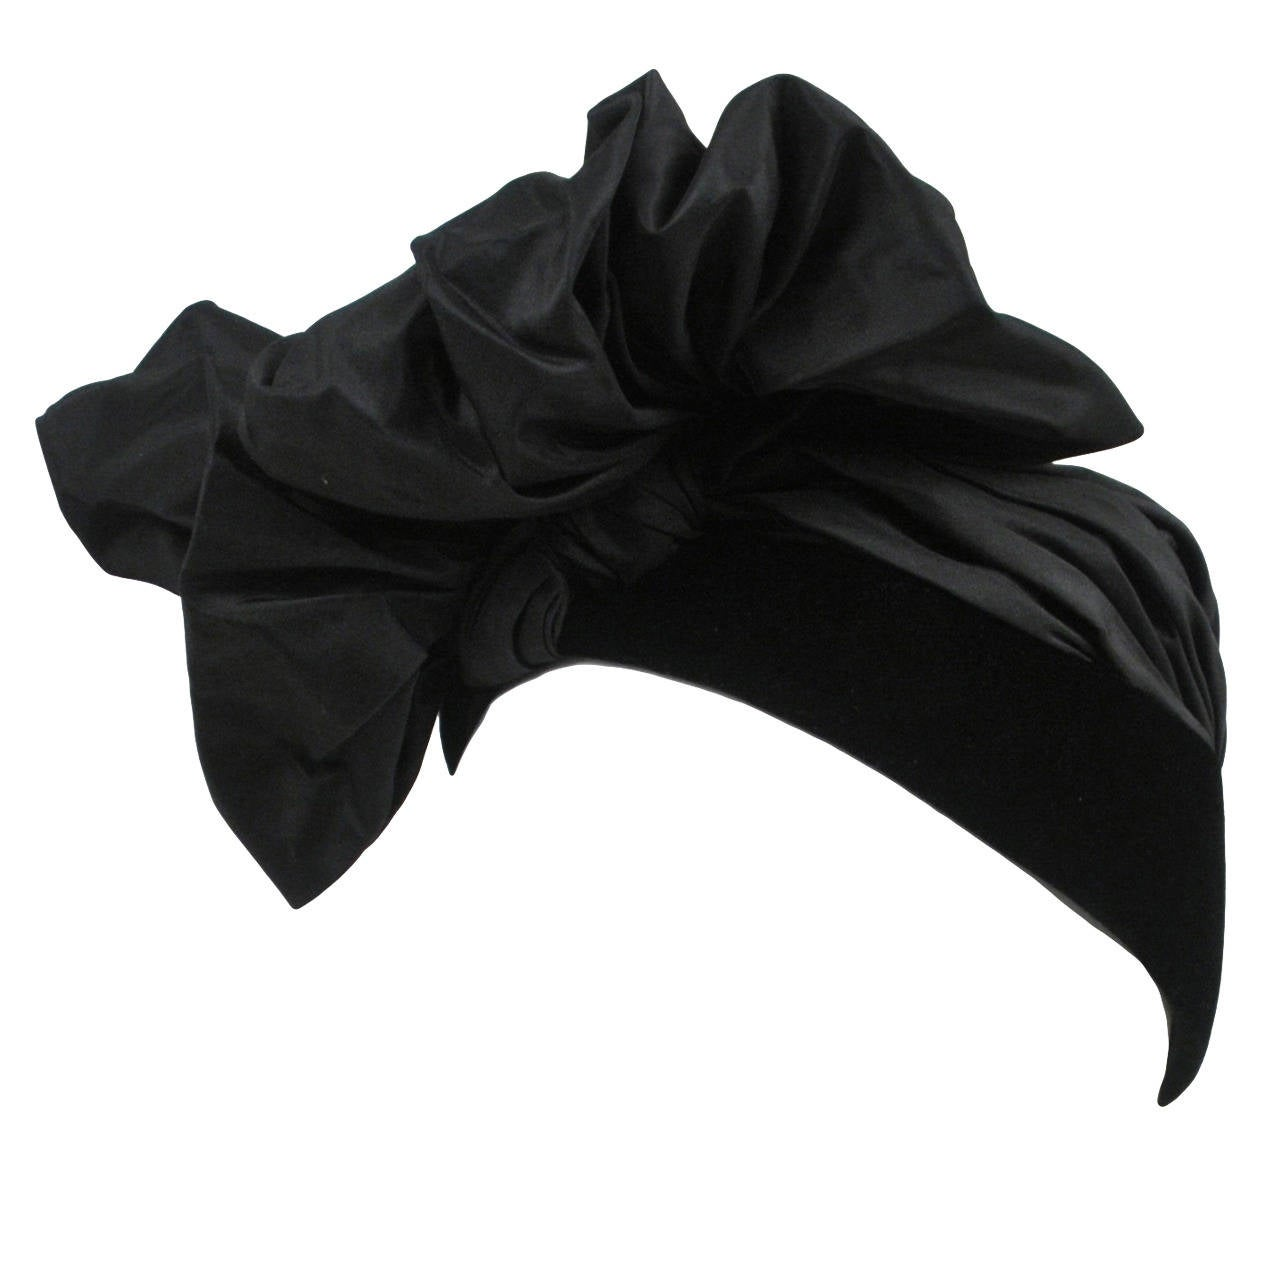 Iconic Saint Laurent Turban Hat 1